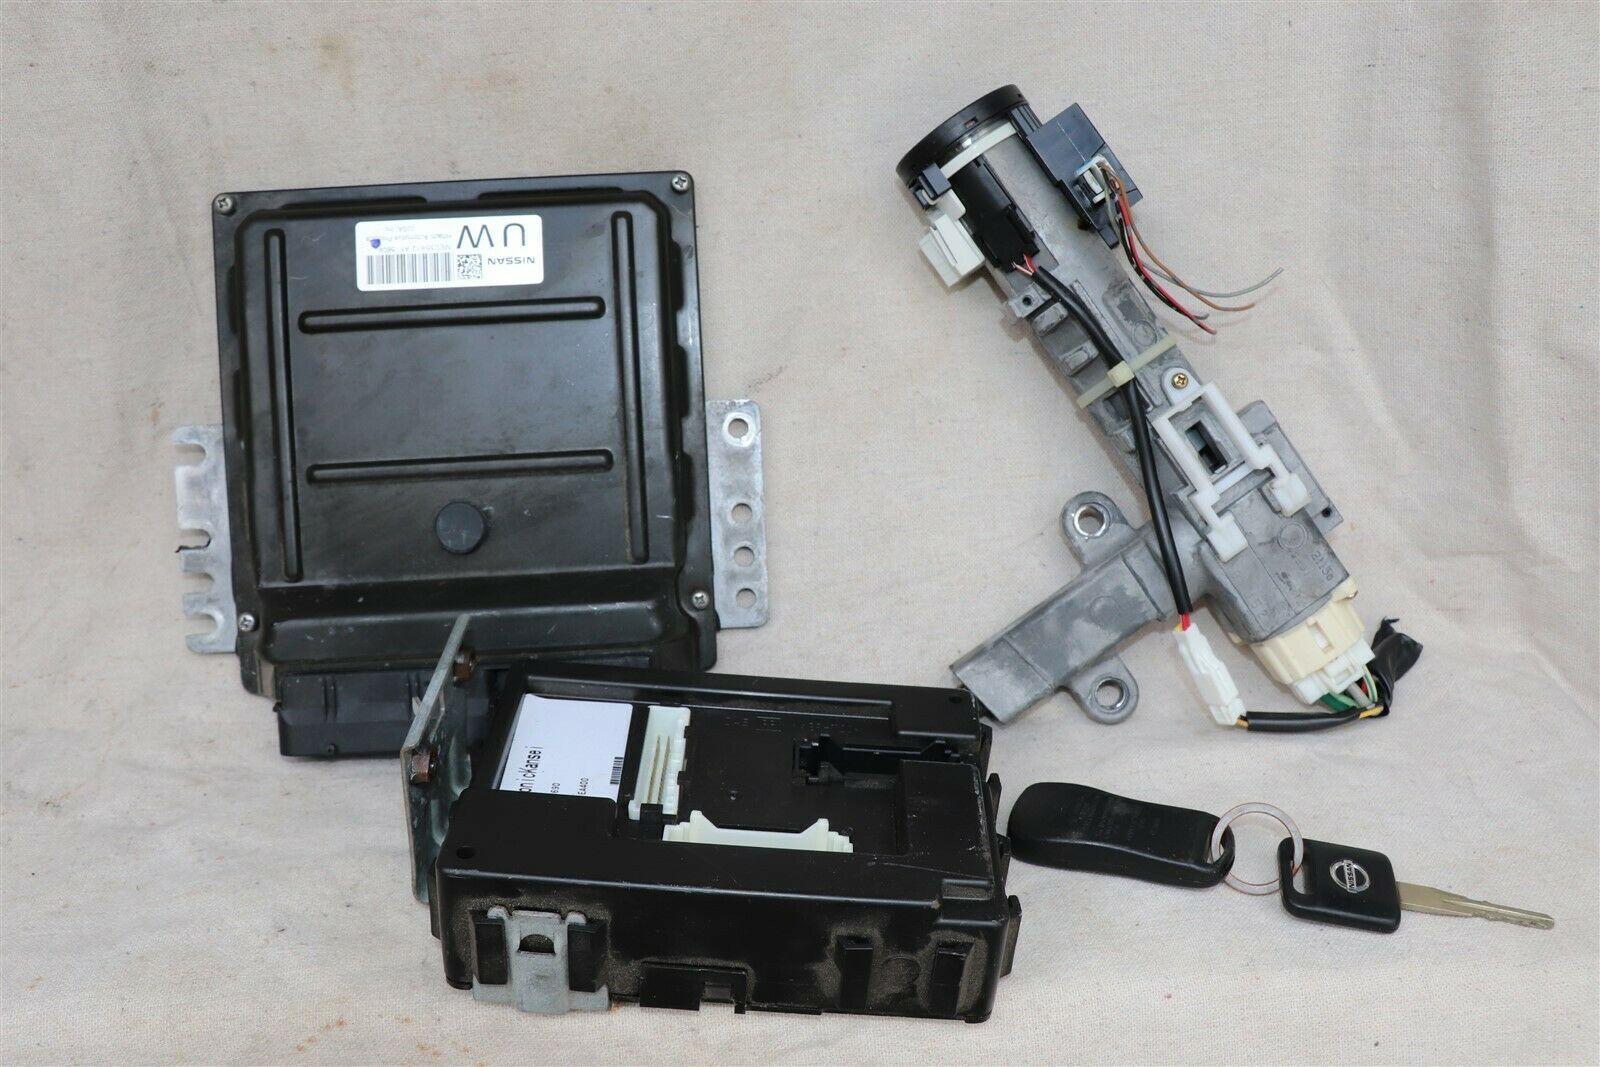 2005 Nissan Xterra 4x2 ECU ECM Computer BCM Ignition Switch W/ Key MEC35-612-A1